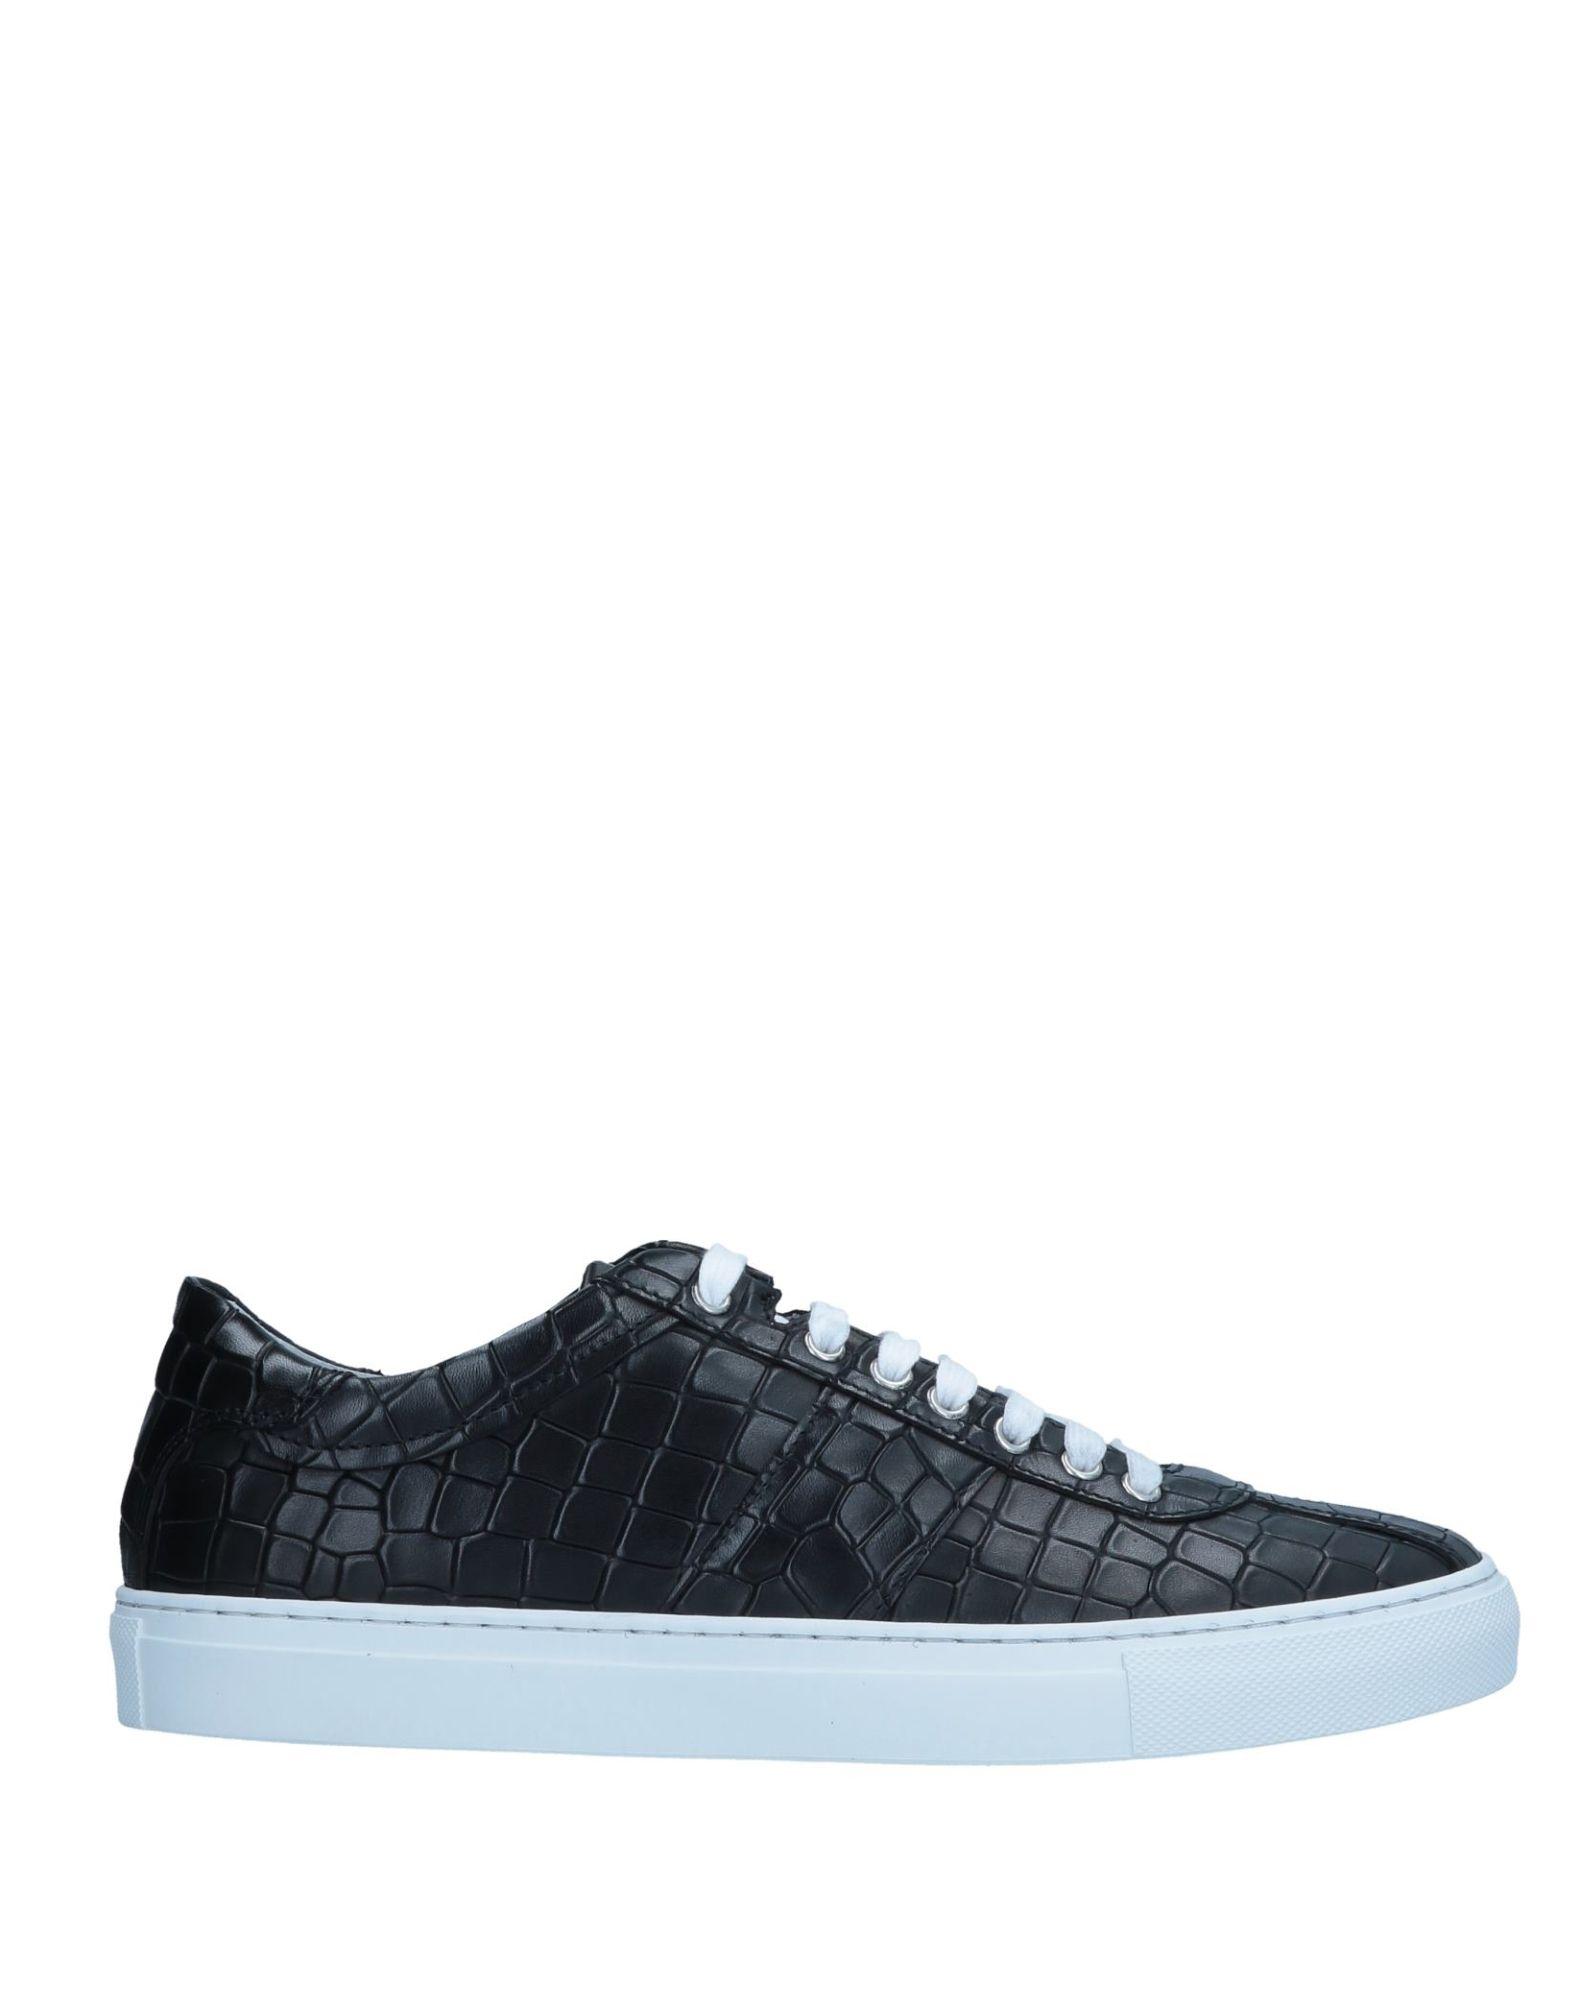 Fabiano Ricci Sneakers Sneakers - Men Fabiano Ricci Sneakers Sneakers online on  Canada - 11547084BB cd2ba0